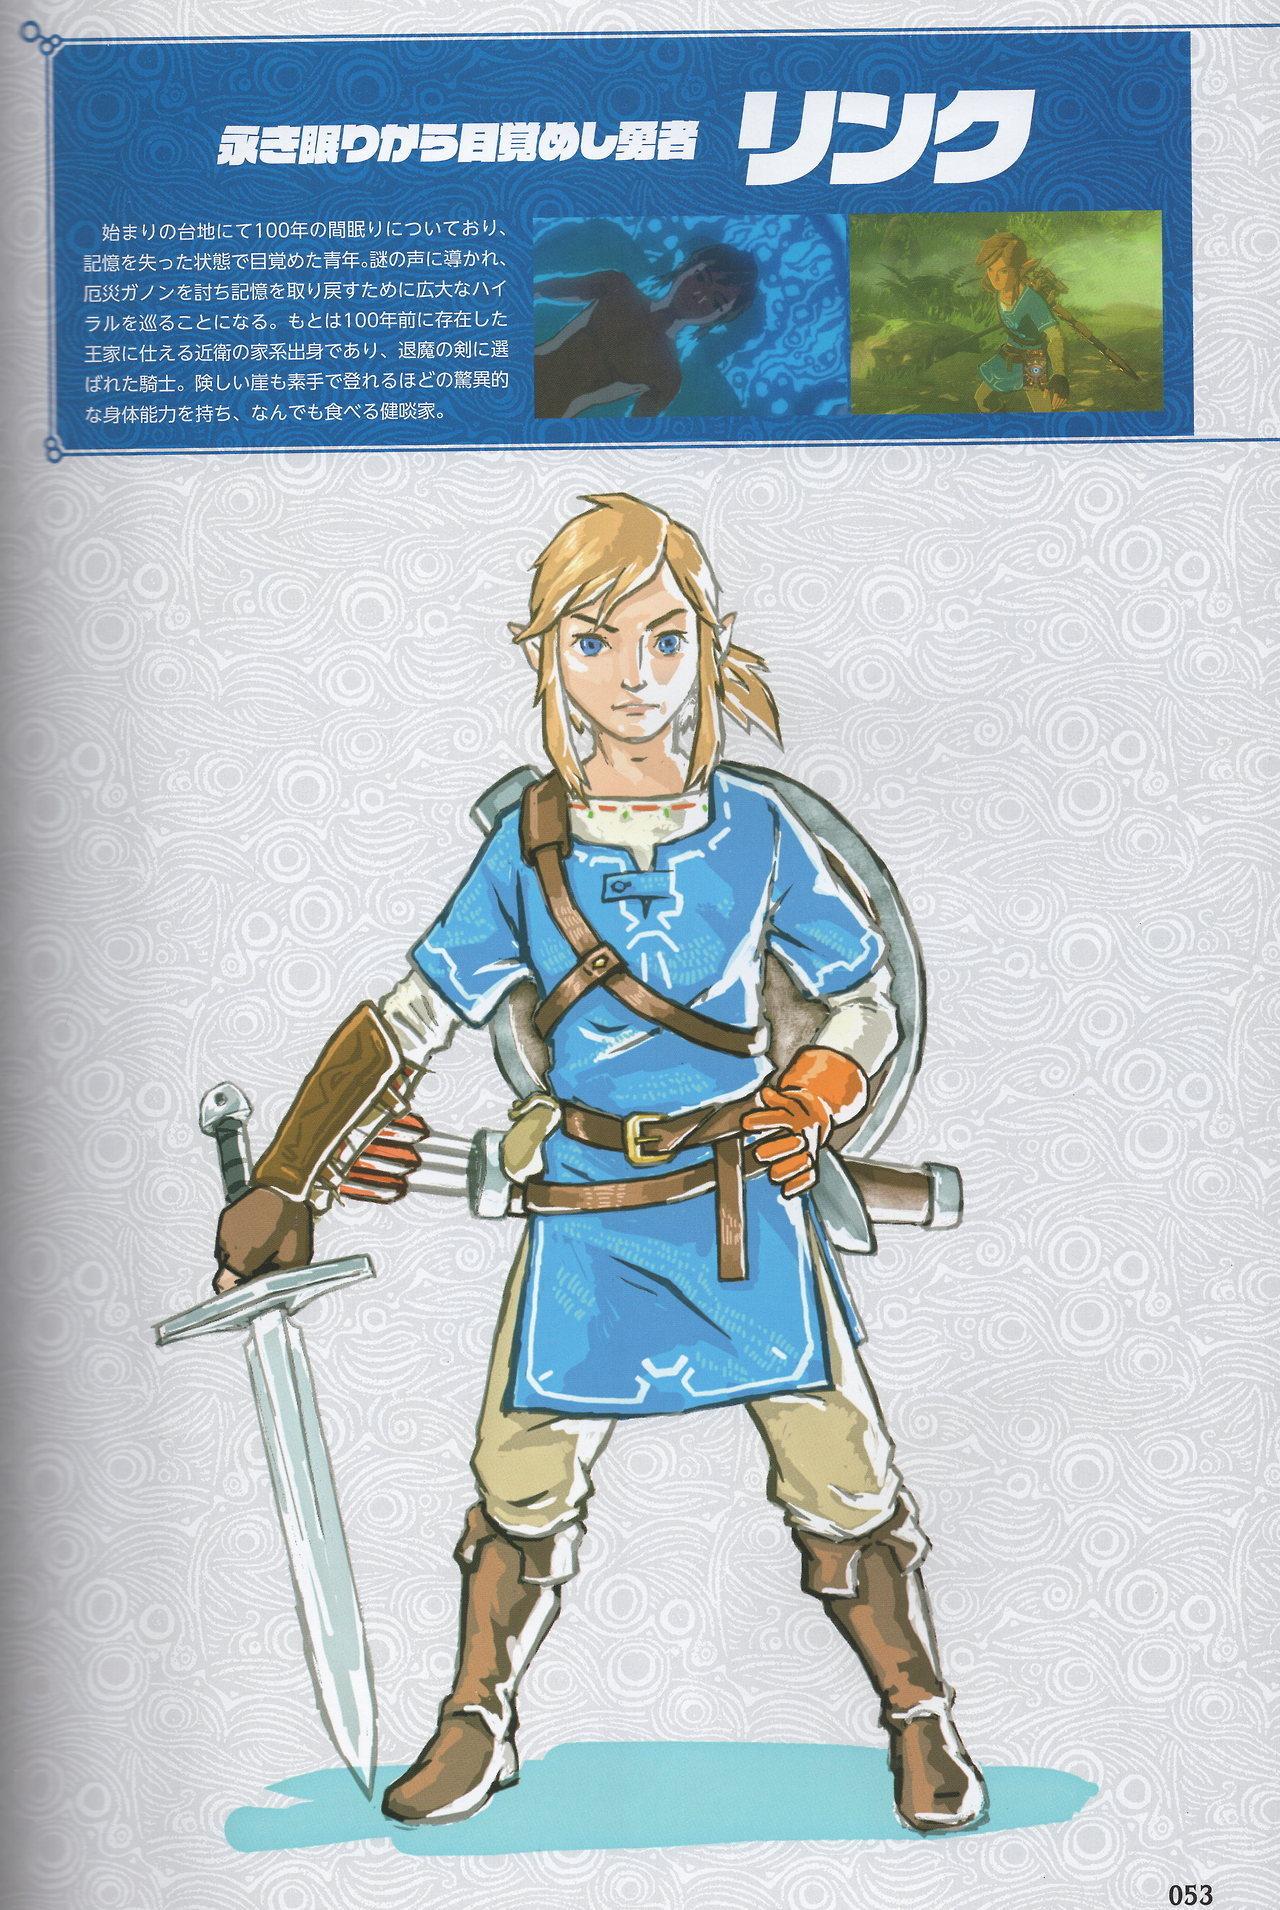 Active The Legend Of Zelda Cosplay Weapon Triforce Shield Sword Set Halloween Cosplay Handhelds Carnaval Deguisement Kid Cosplay Toy Top Watermelons Novelty & Special Use